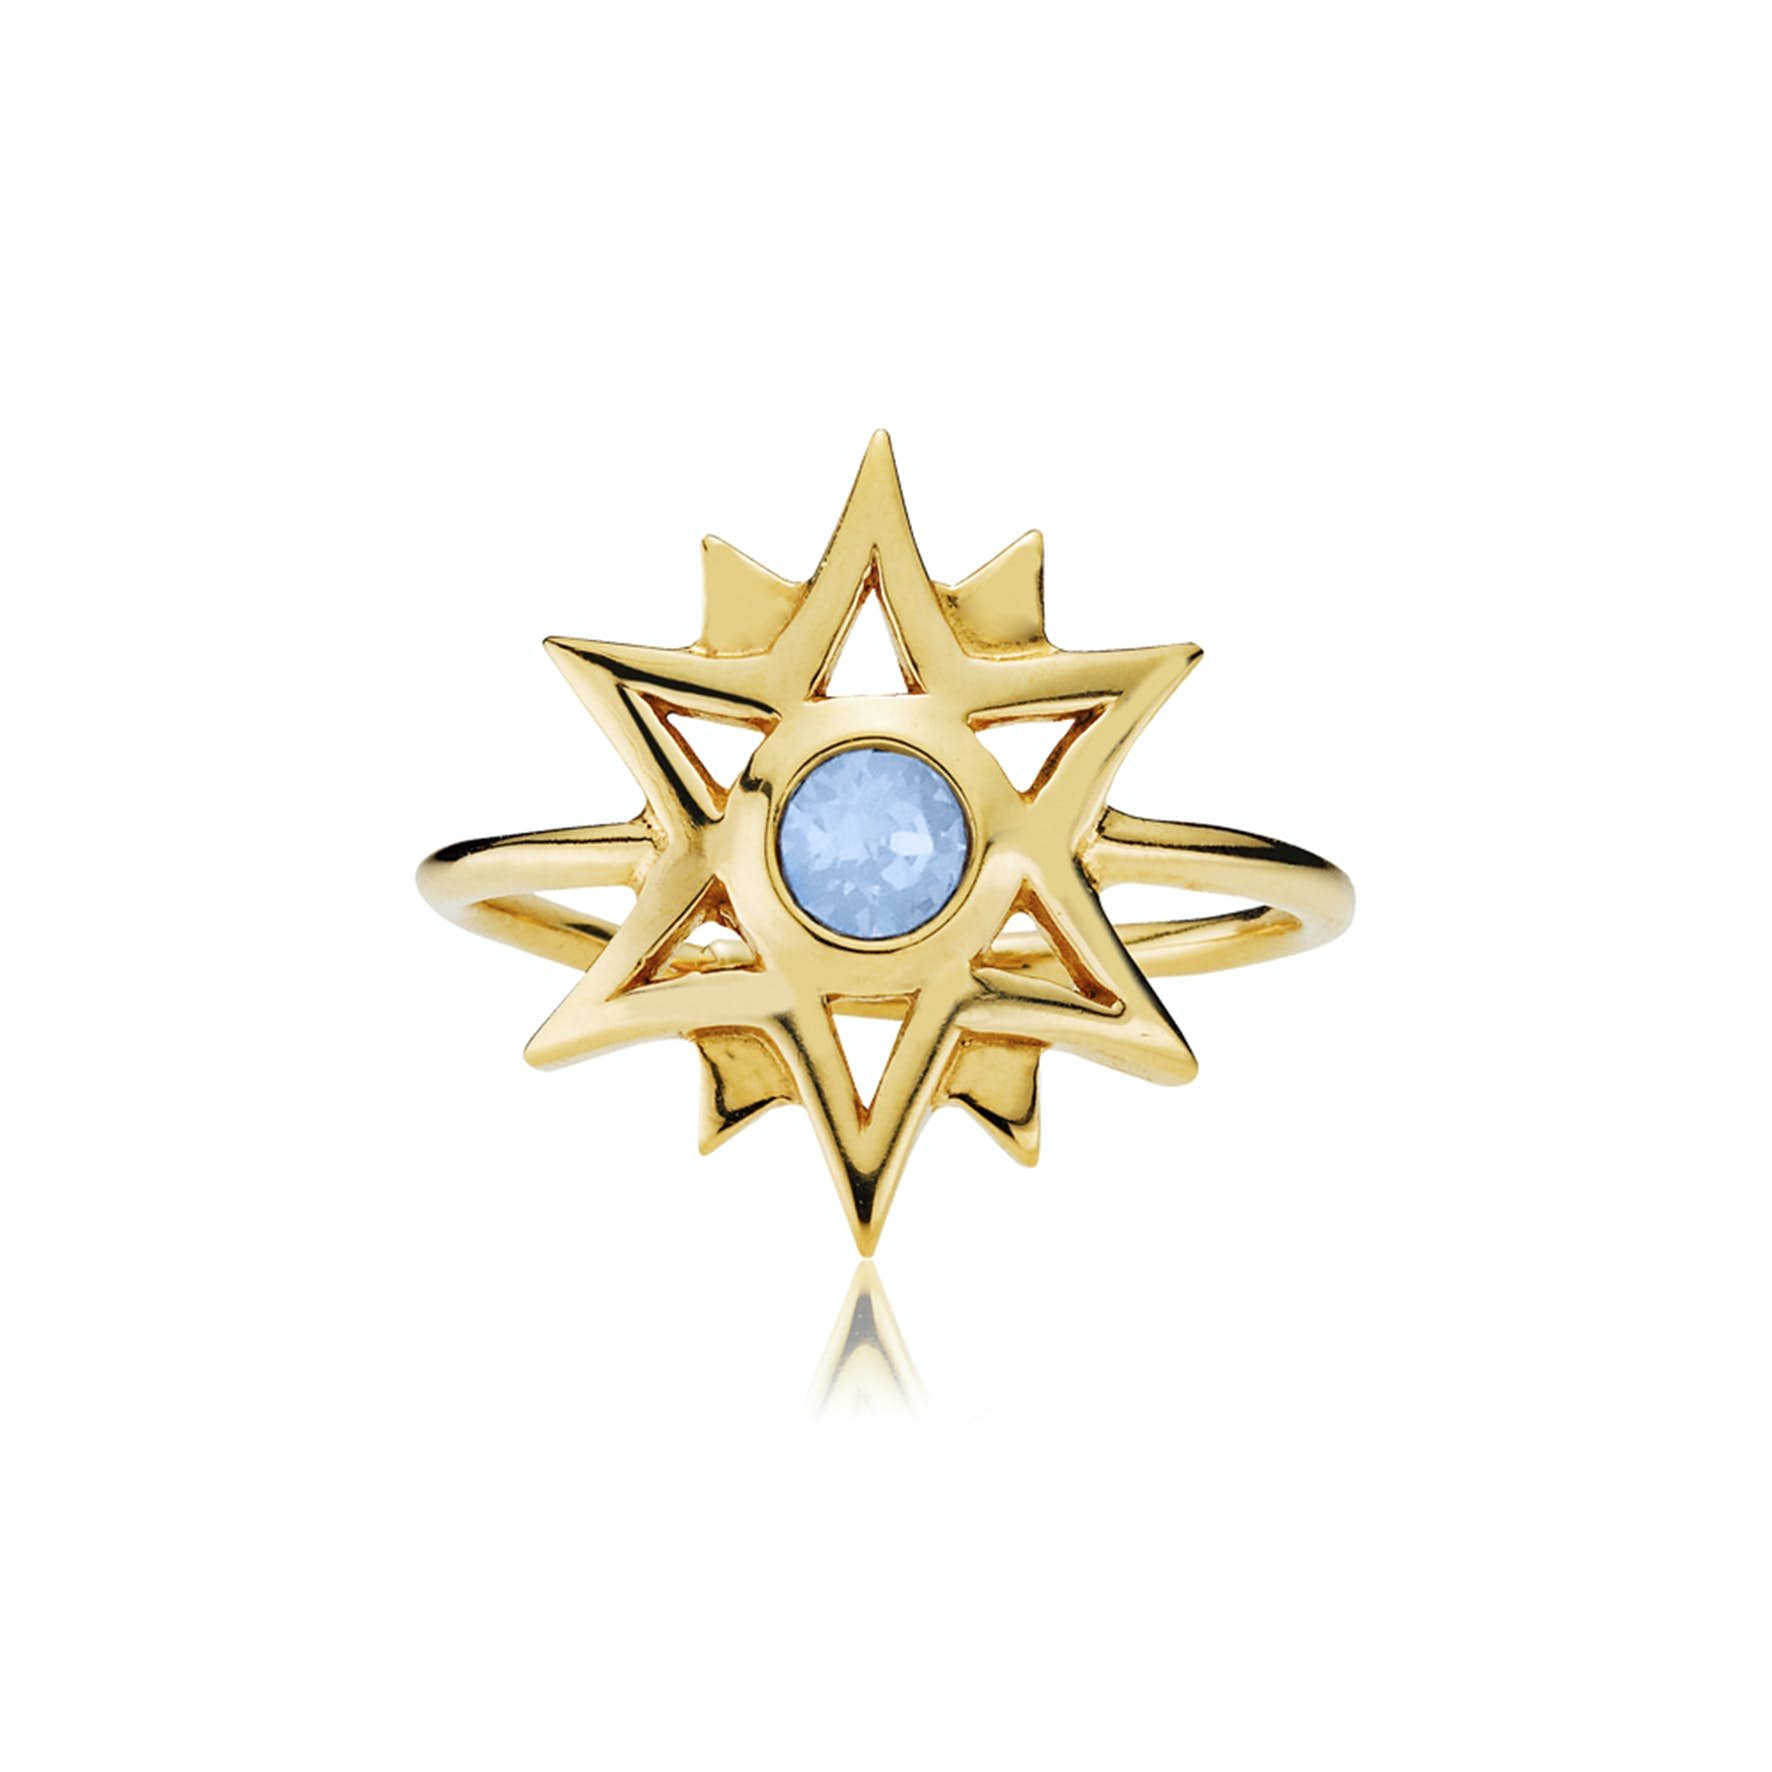 Olivia by Sistie Ring fra Sistie i Forgylt-Sølv Sterling 925